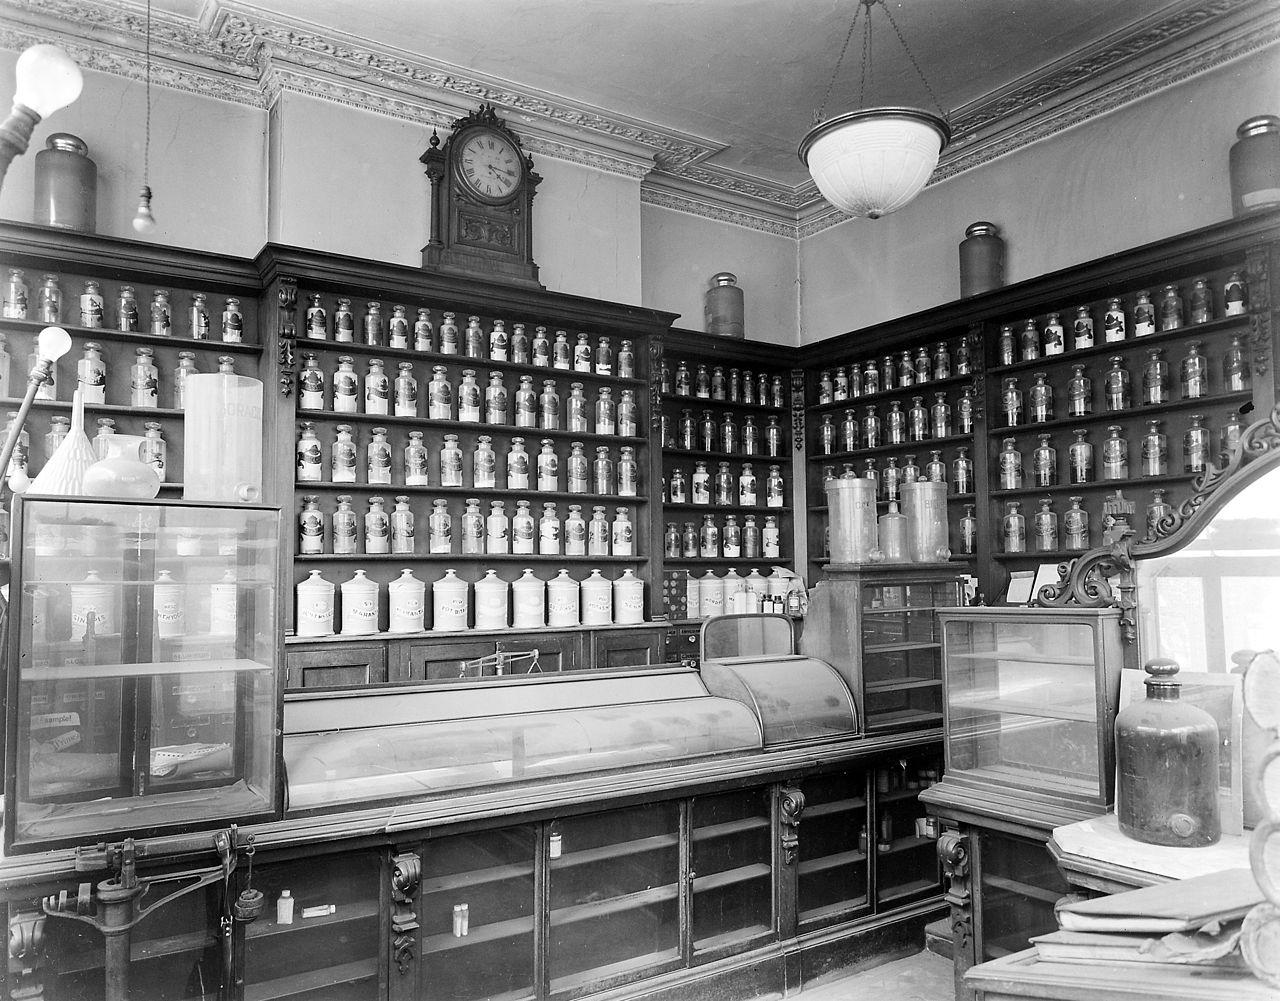 Late_19th_century_Chemist's_shop_Wellcome_M0019040.jpg